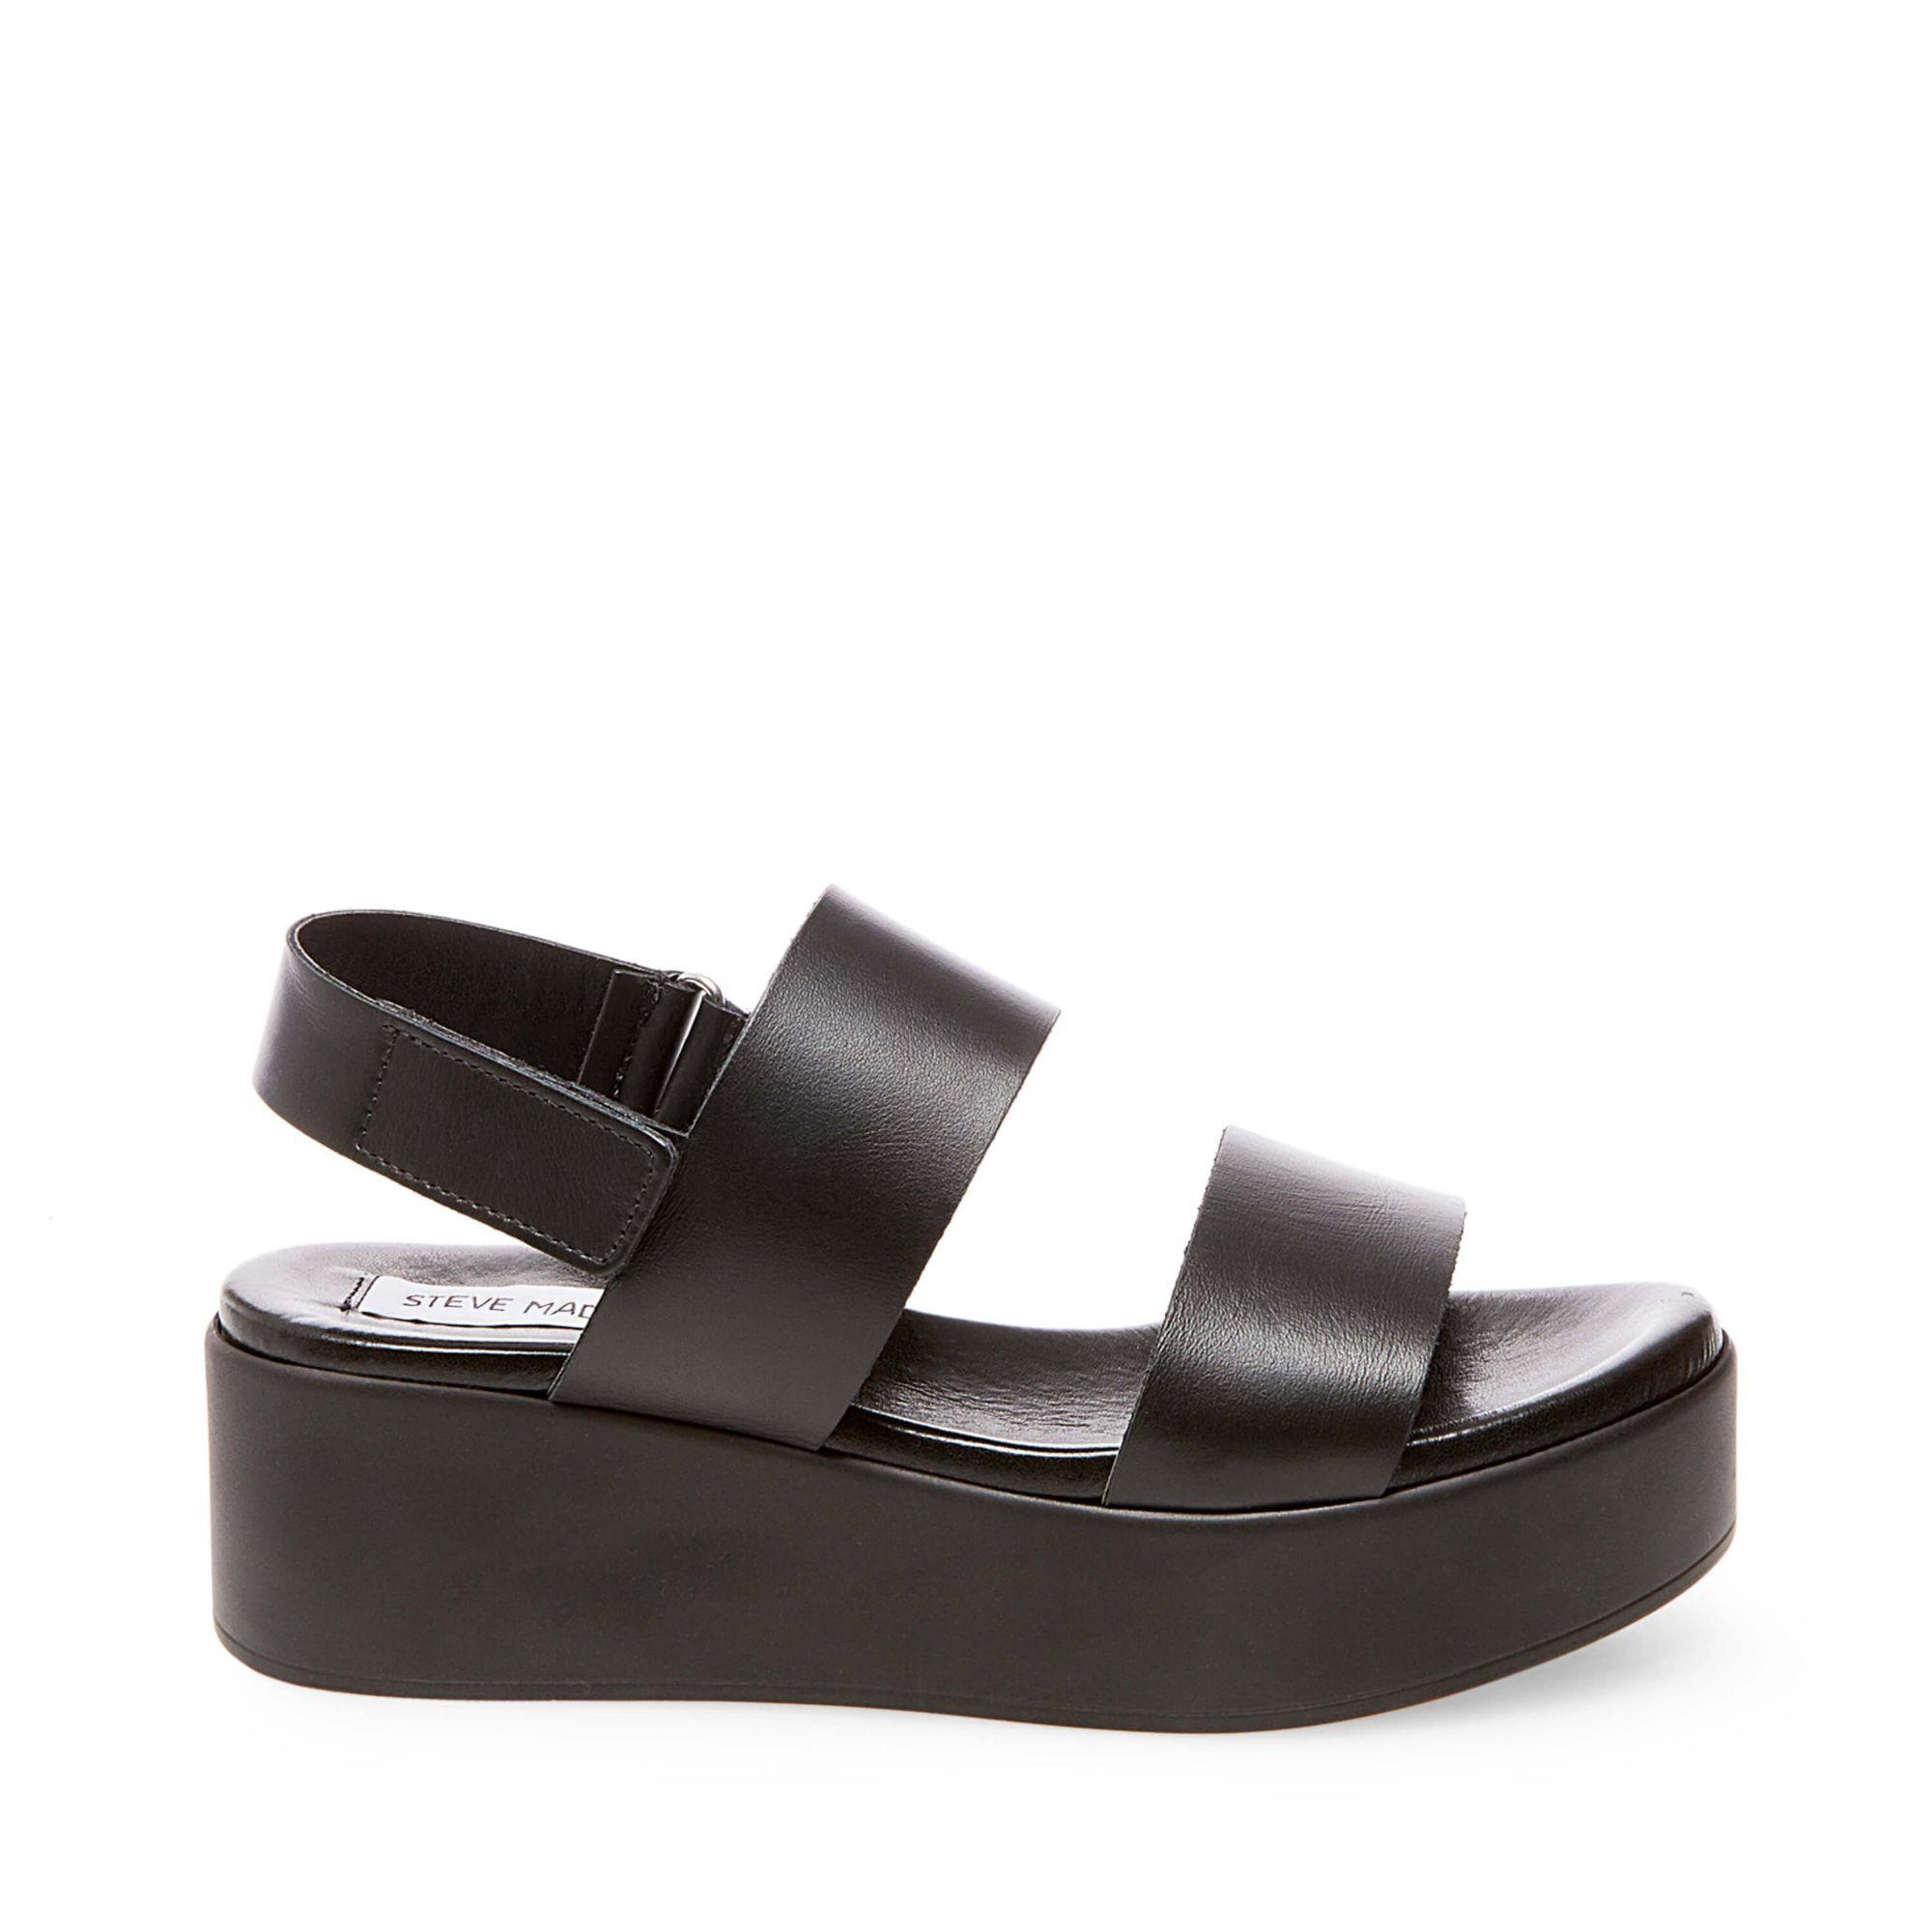 370898f5f4a5 STEVE MADDEN Rachel.  stevemadden  shoes  all